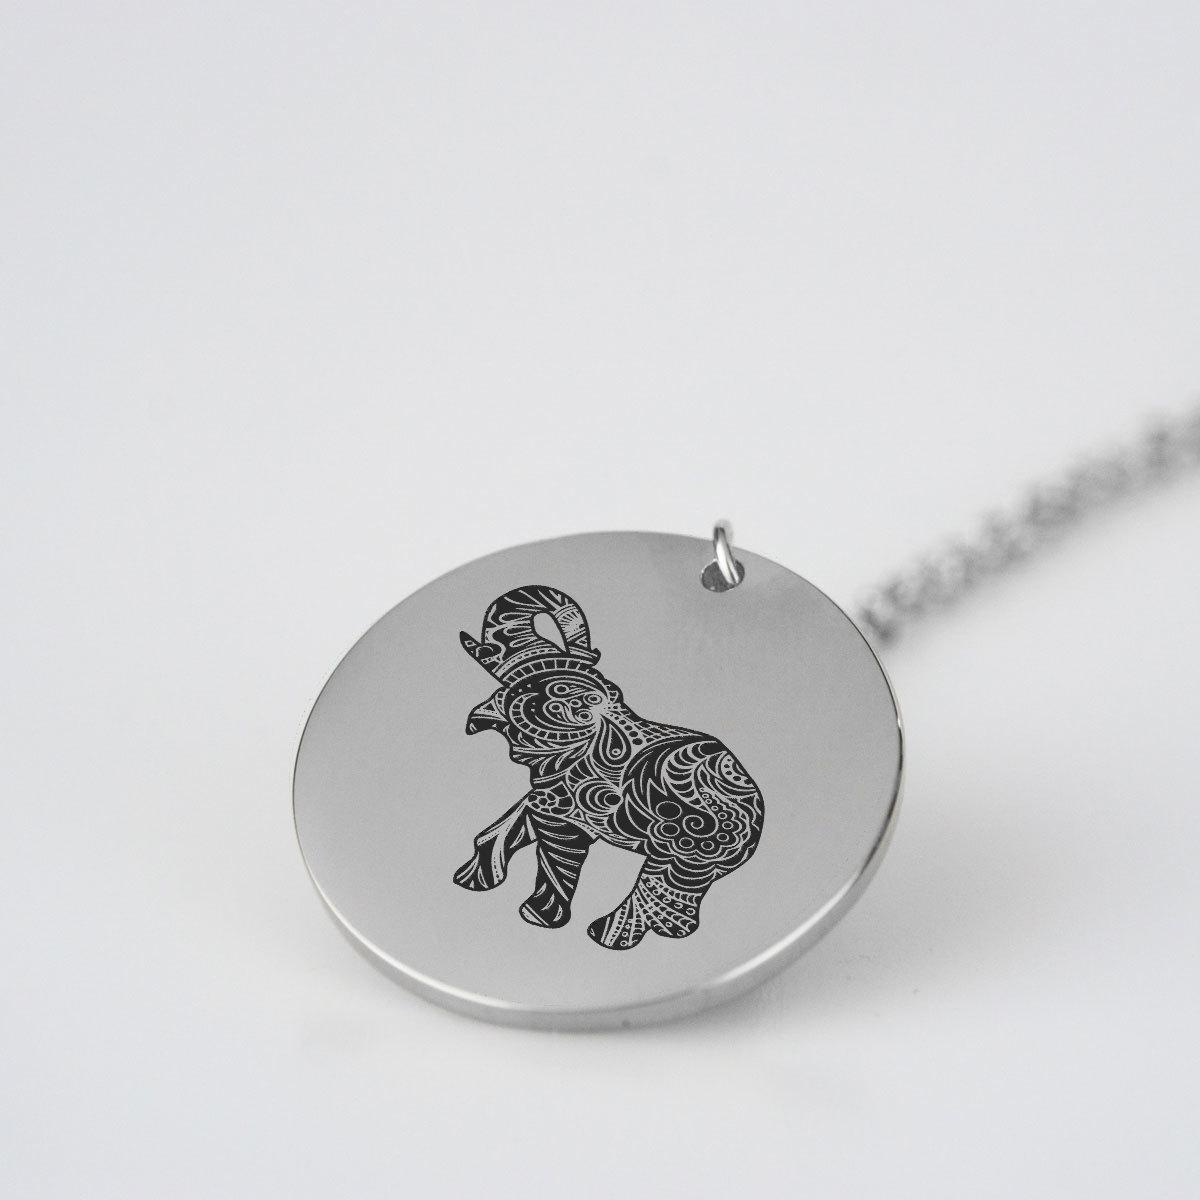 Elephant Silhouette Charm Necklace